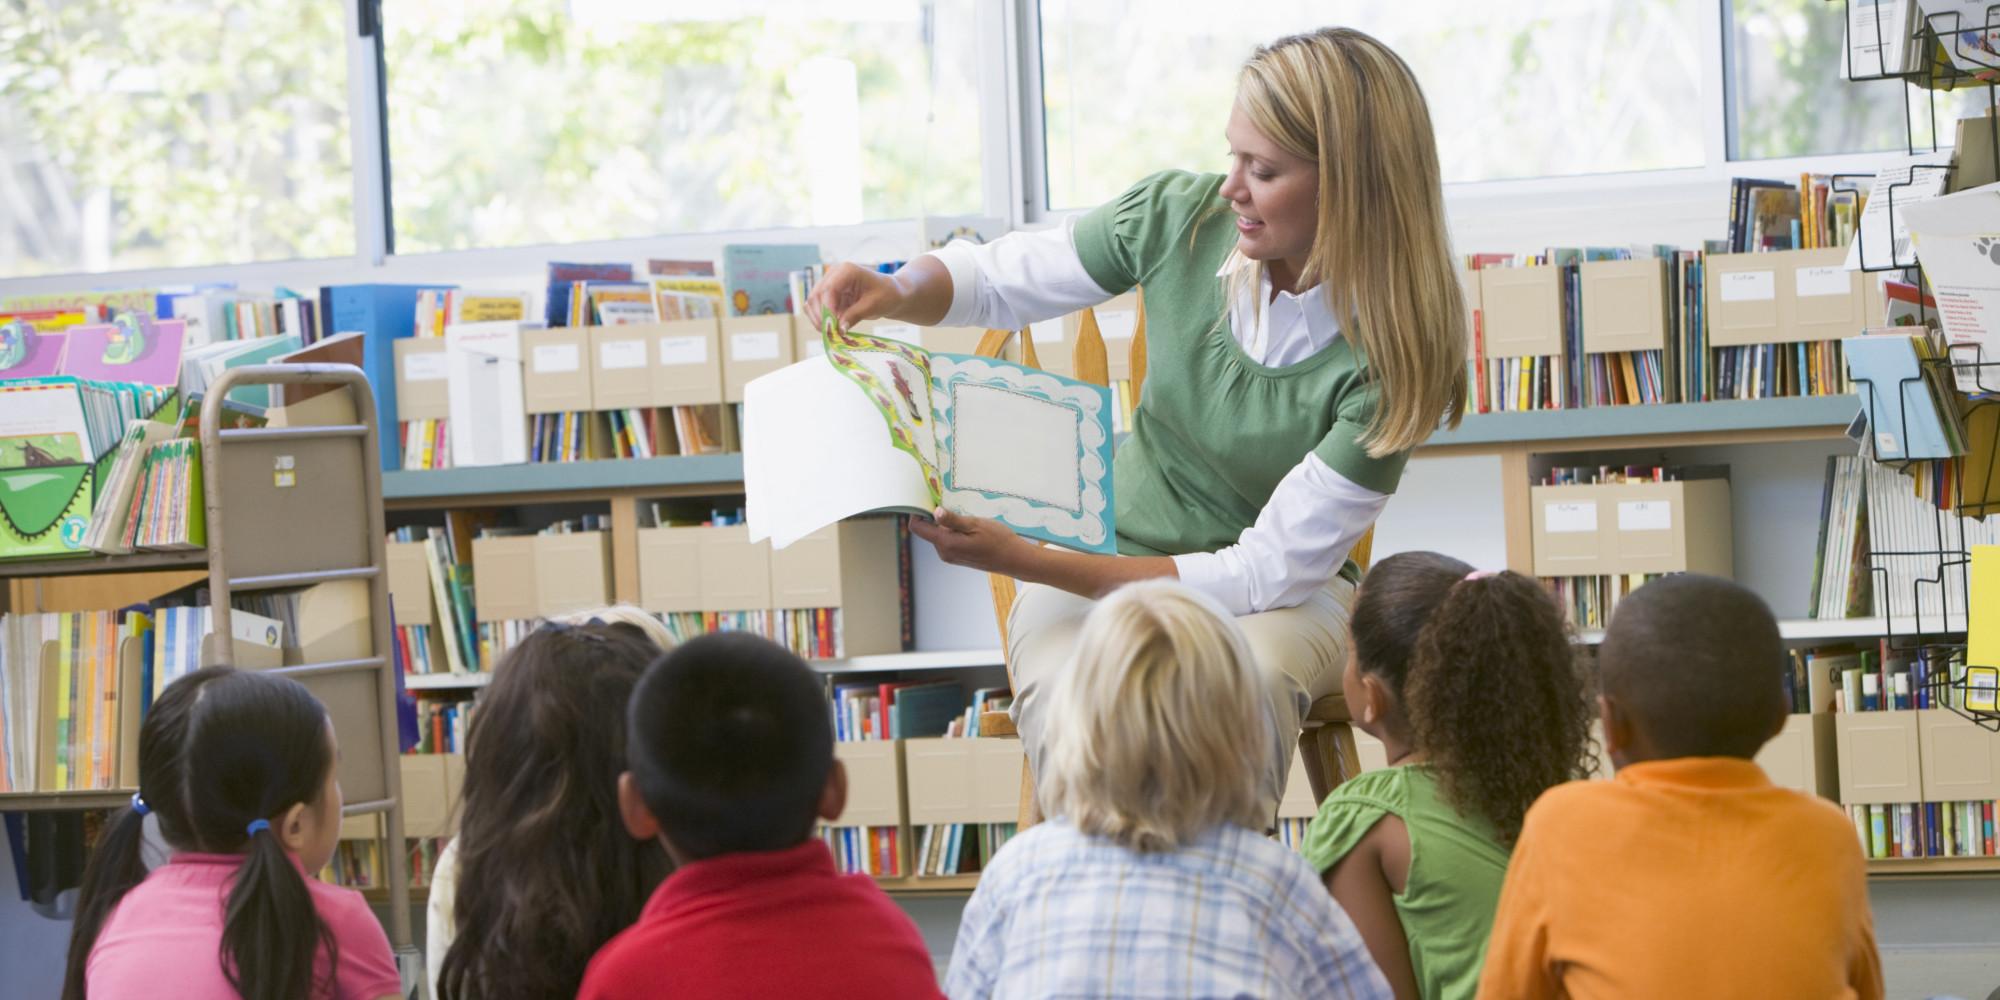 kindergarten letter open teacher son classroom kinder teach education children think